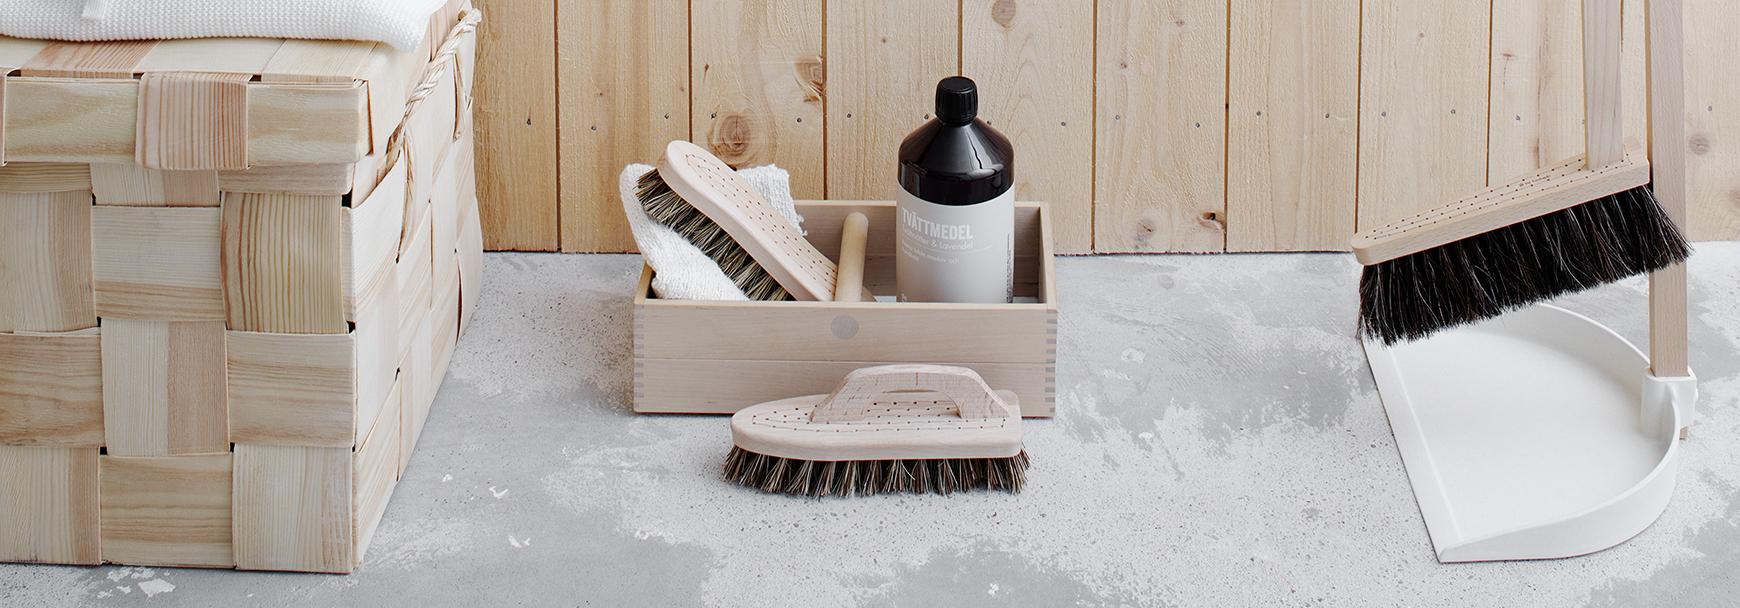 Diska & städa